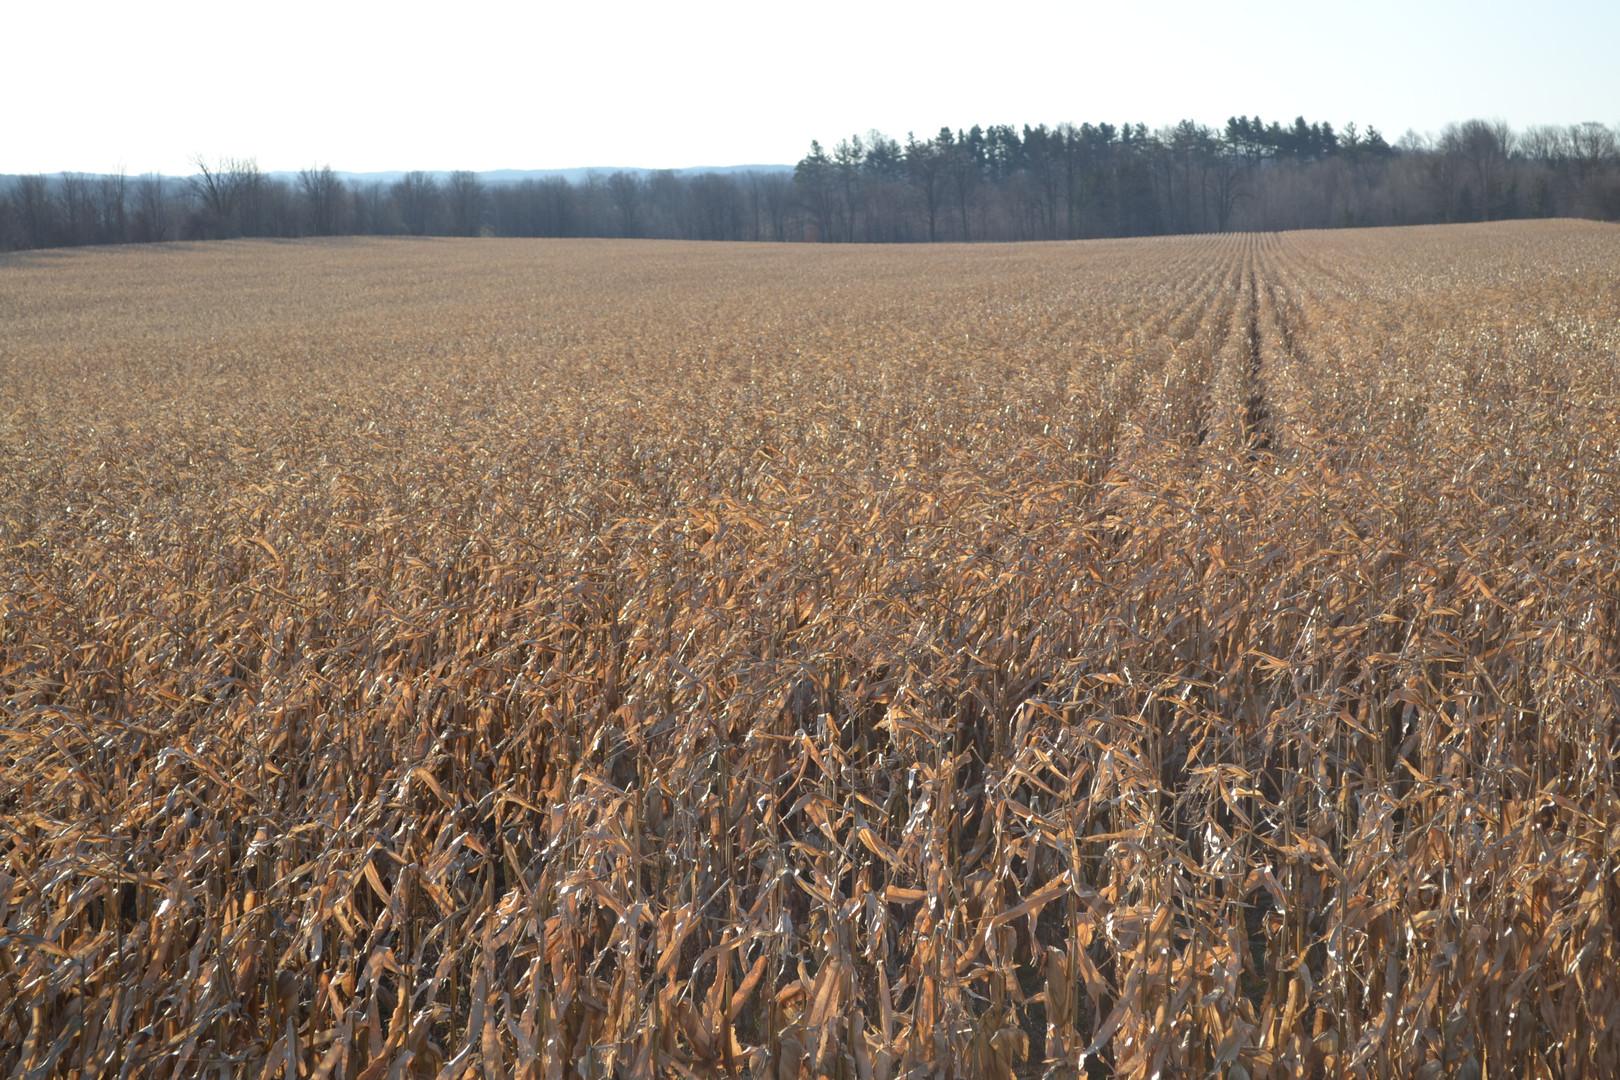 Corn ready for harvest - Carrick west fa